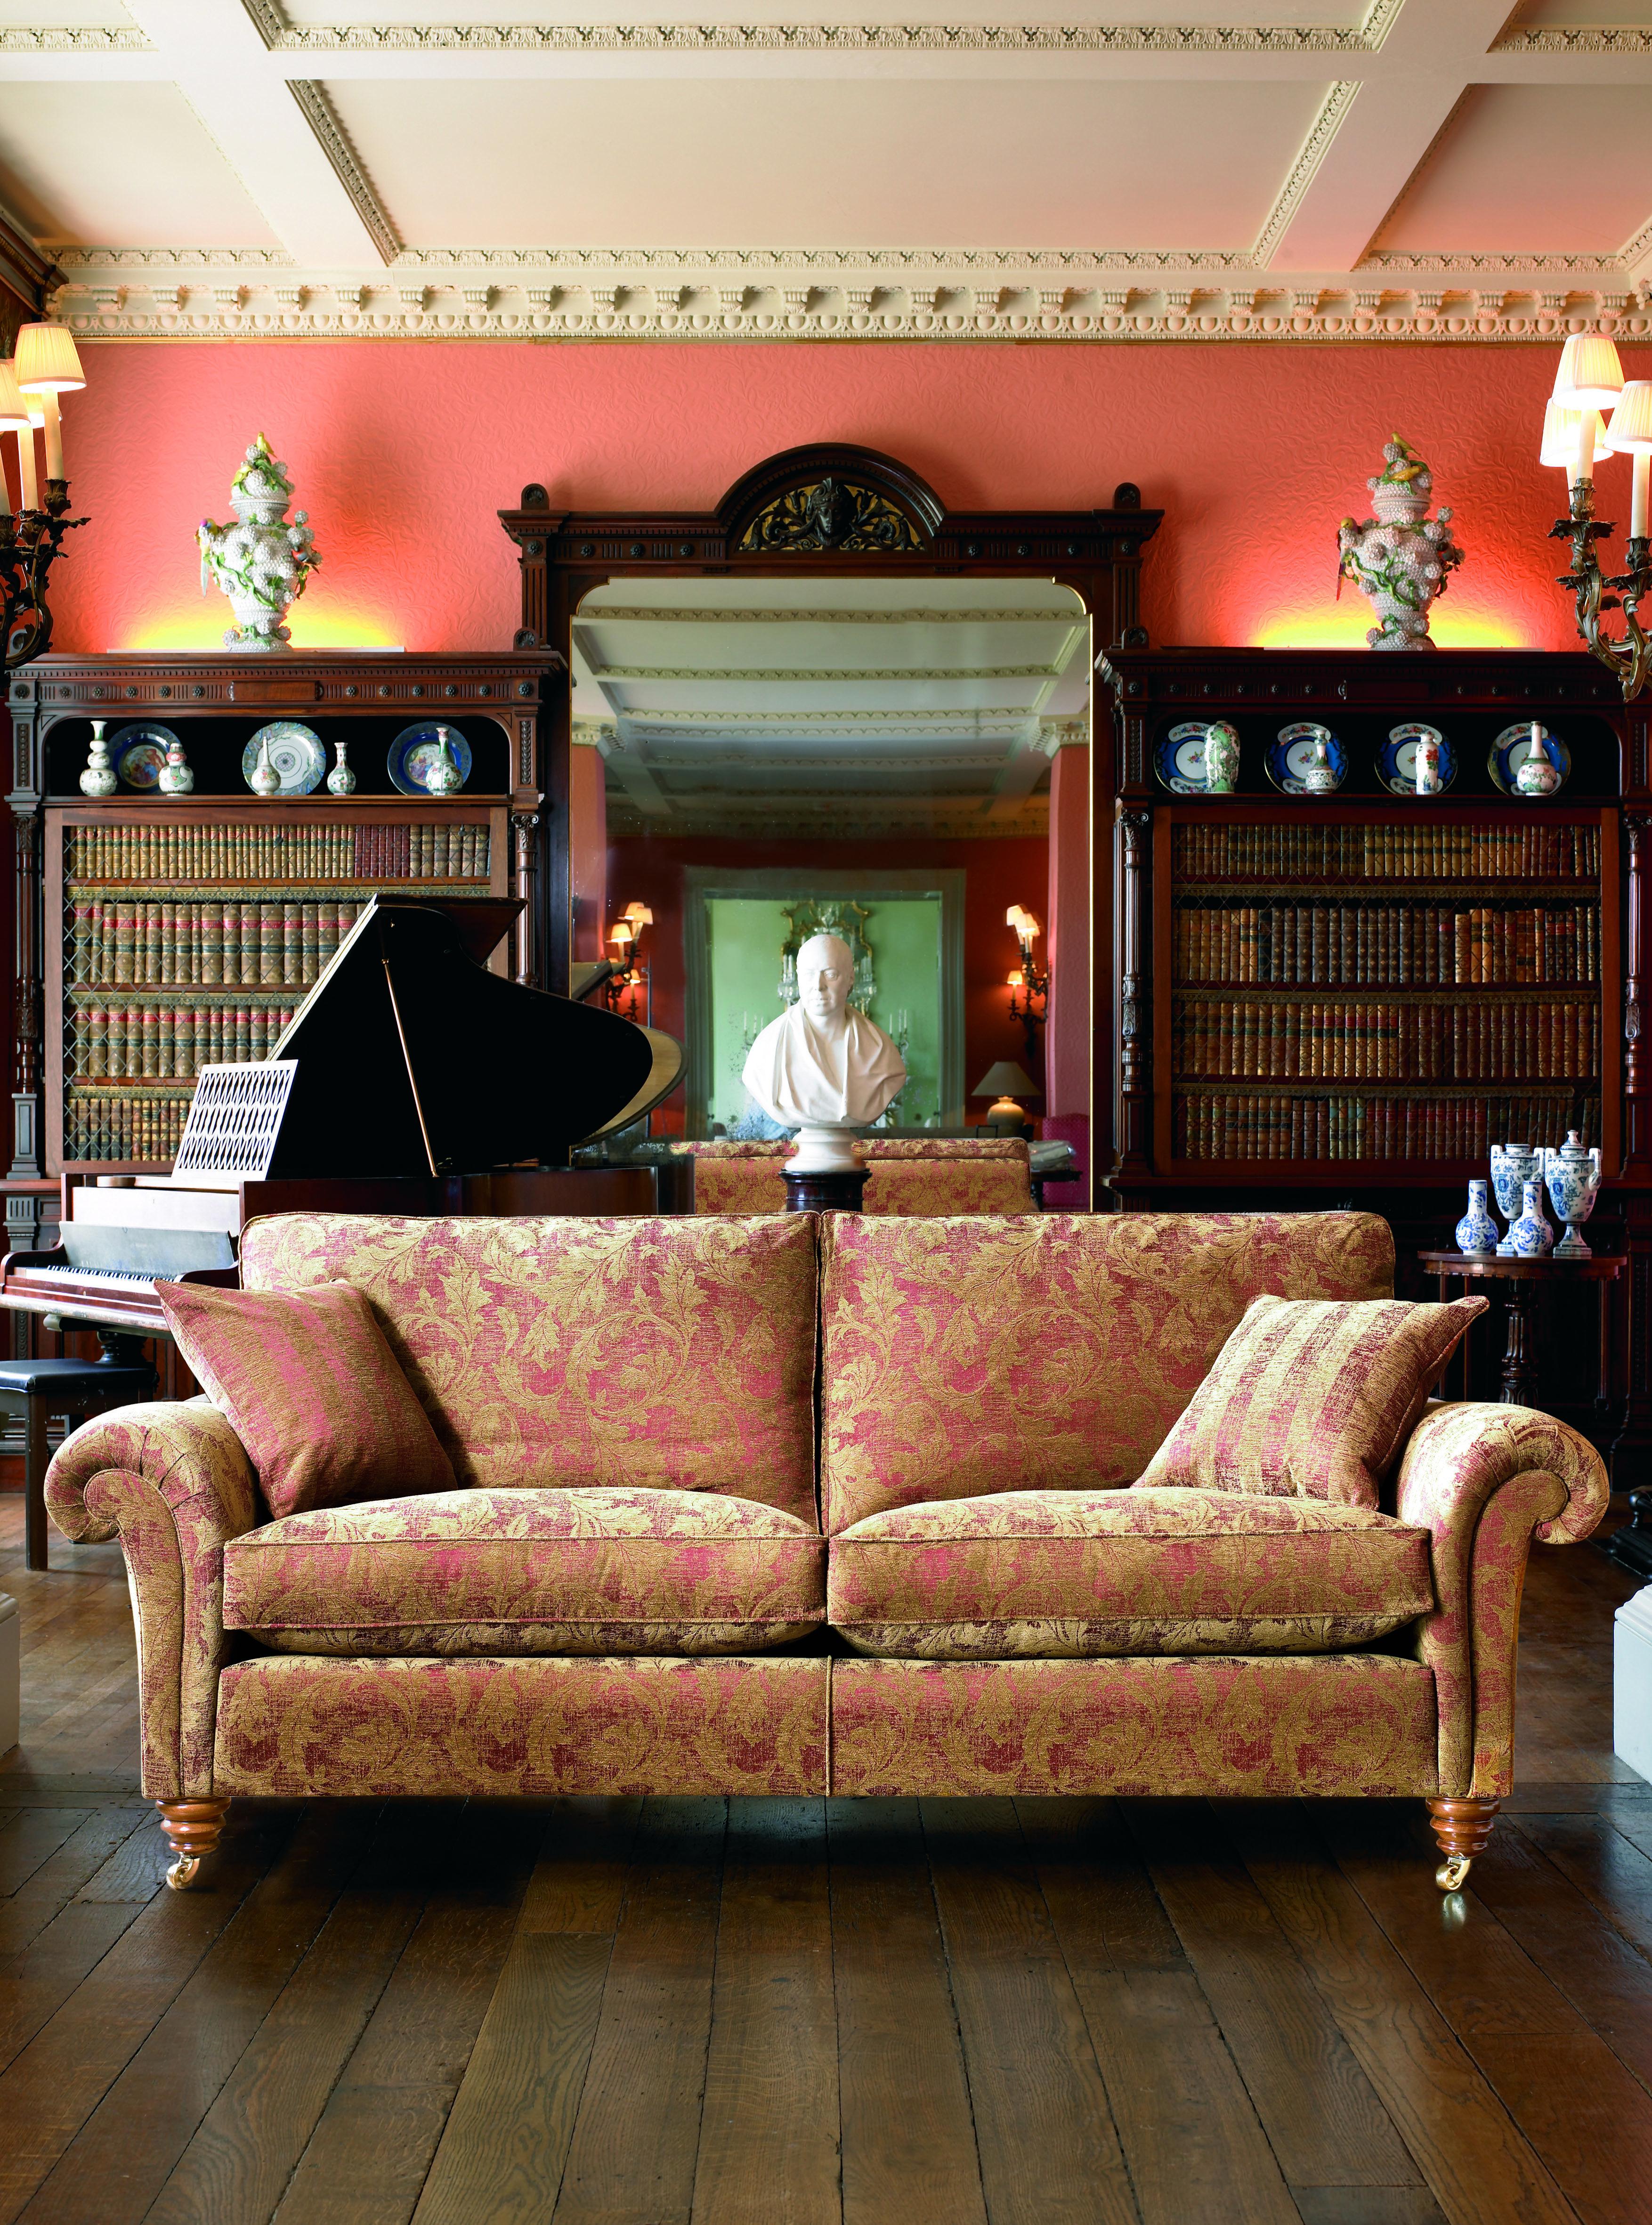 Hoopers Selection Of Sofas Available In Tunbridge Wells Duresta Sofa